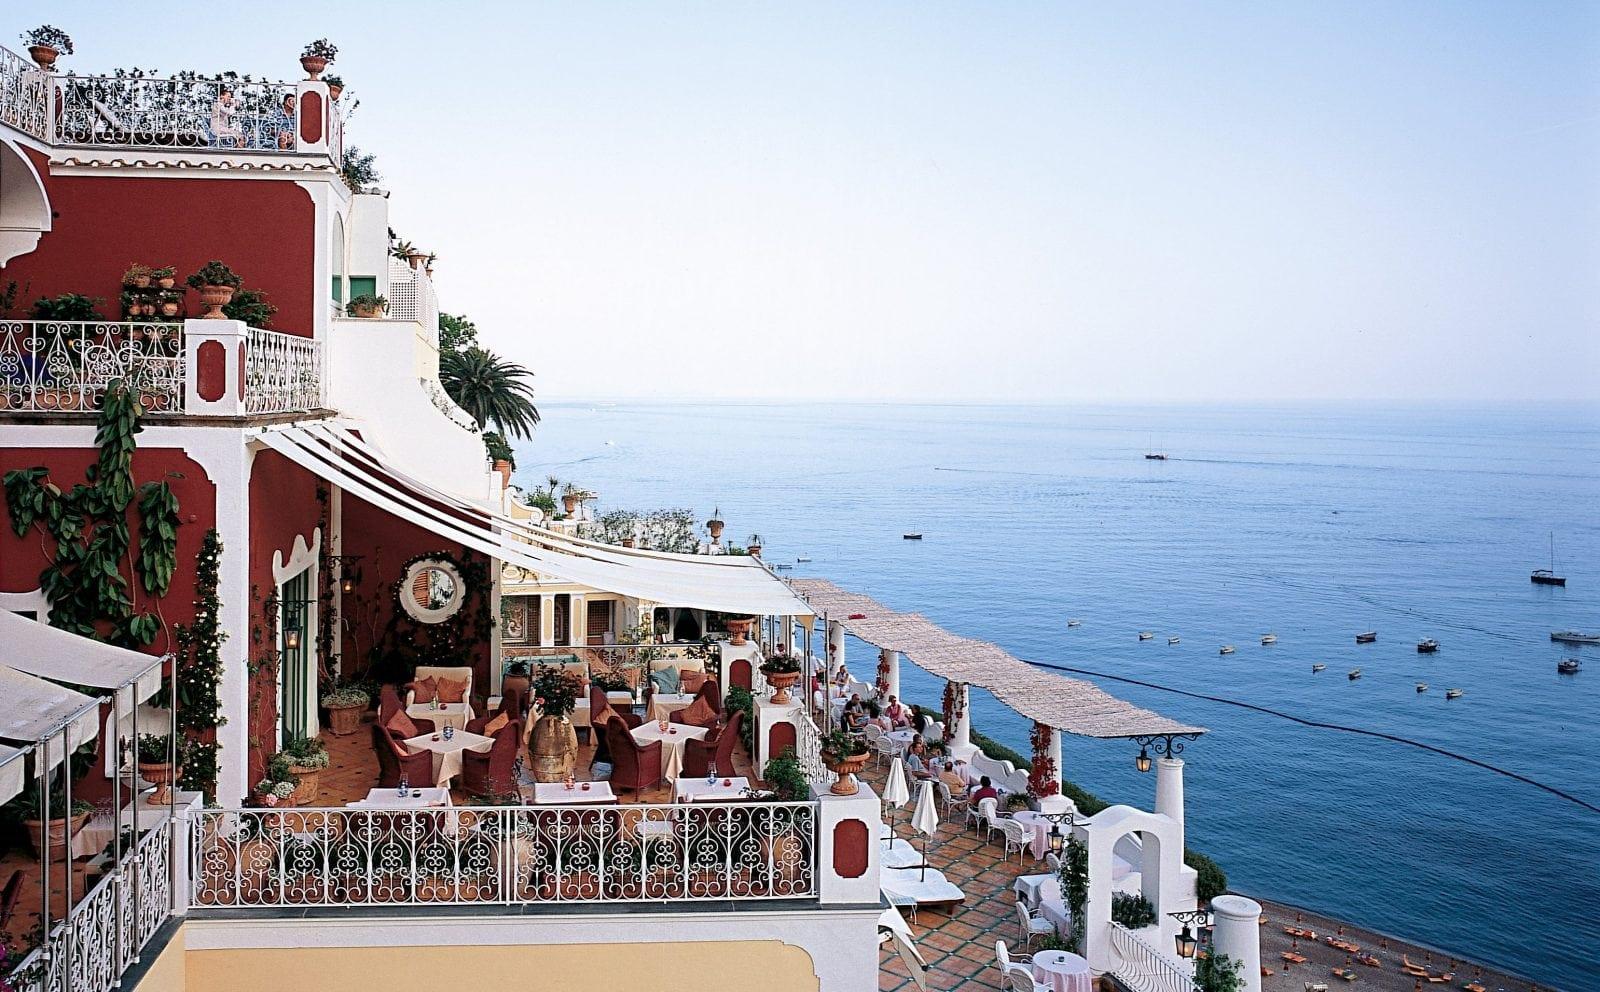 Champ Bar 01 - Le Sirenuse, Positano - istorie și ospitalitate italiană